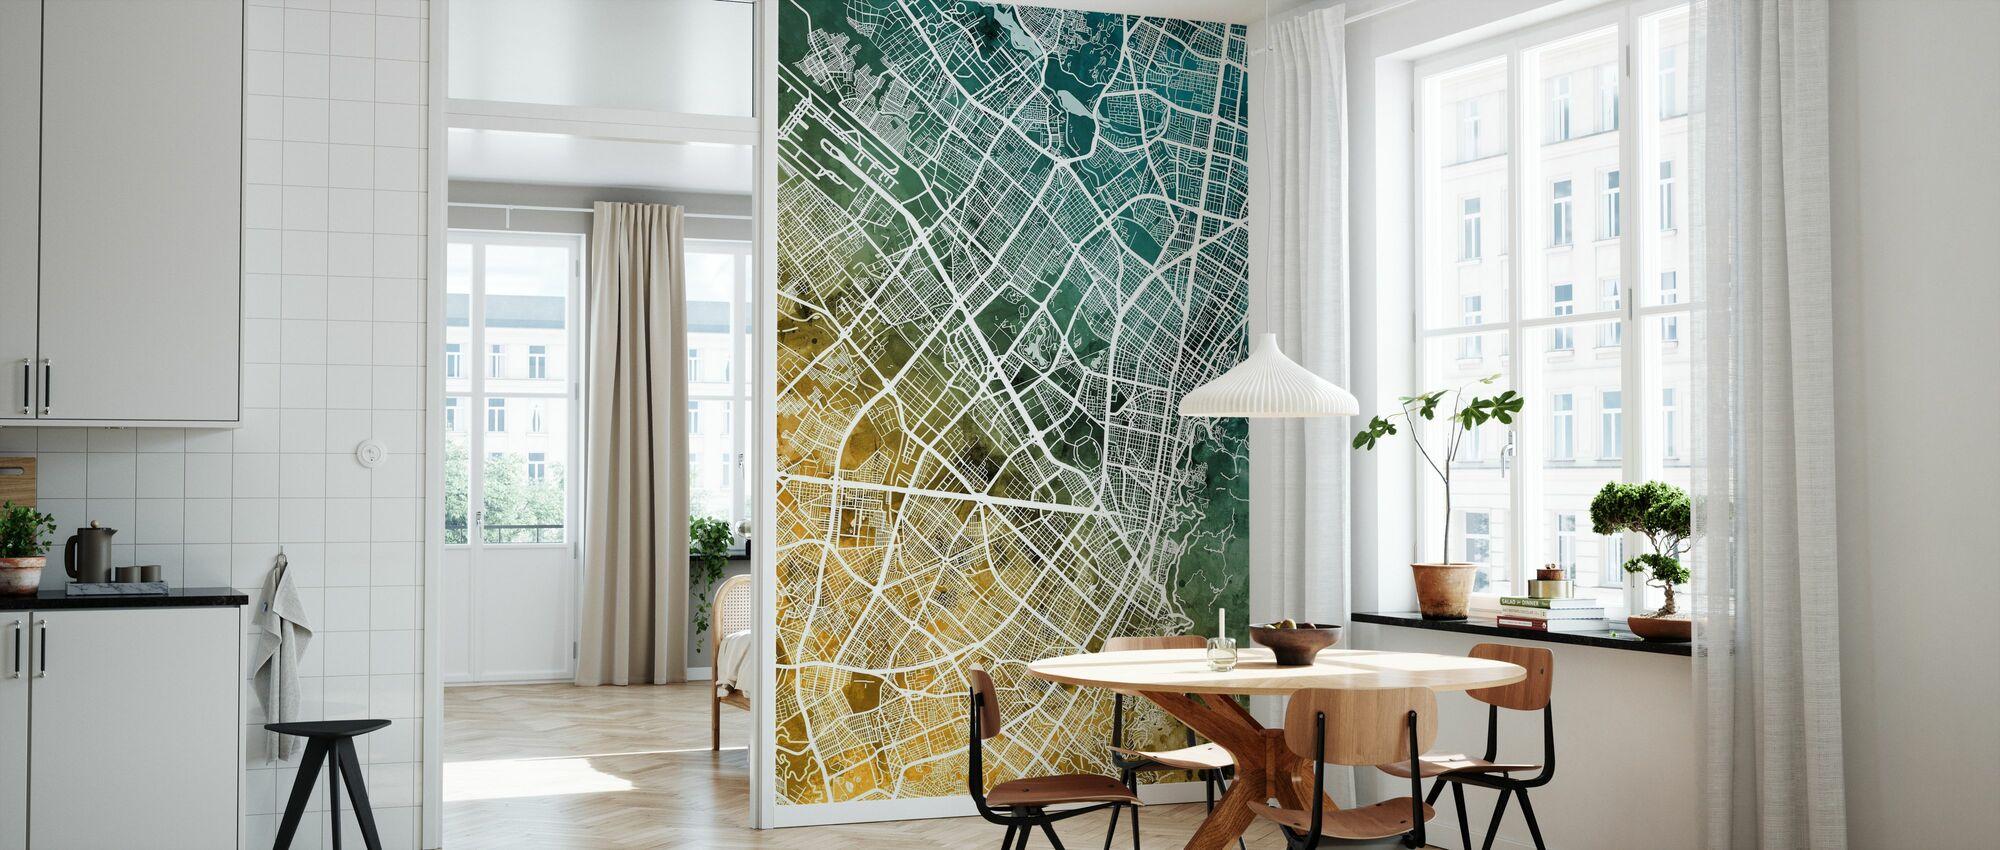 Bogota Colombia City Map - Wallpaper - Kitchen